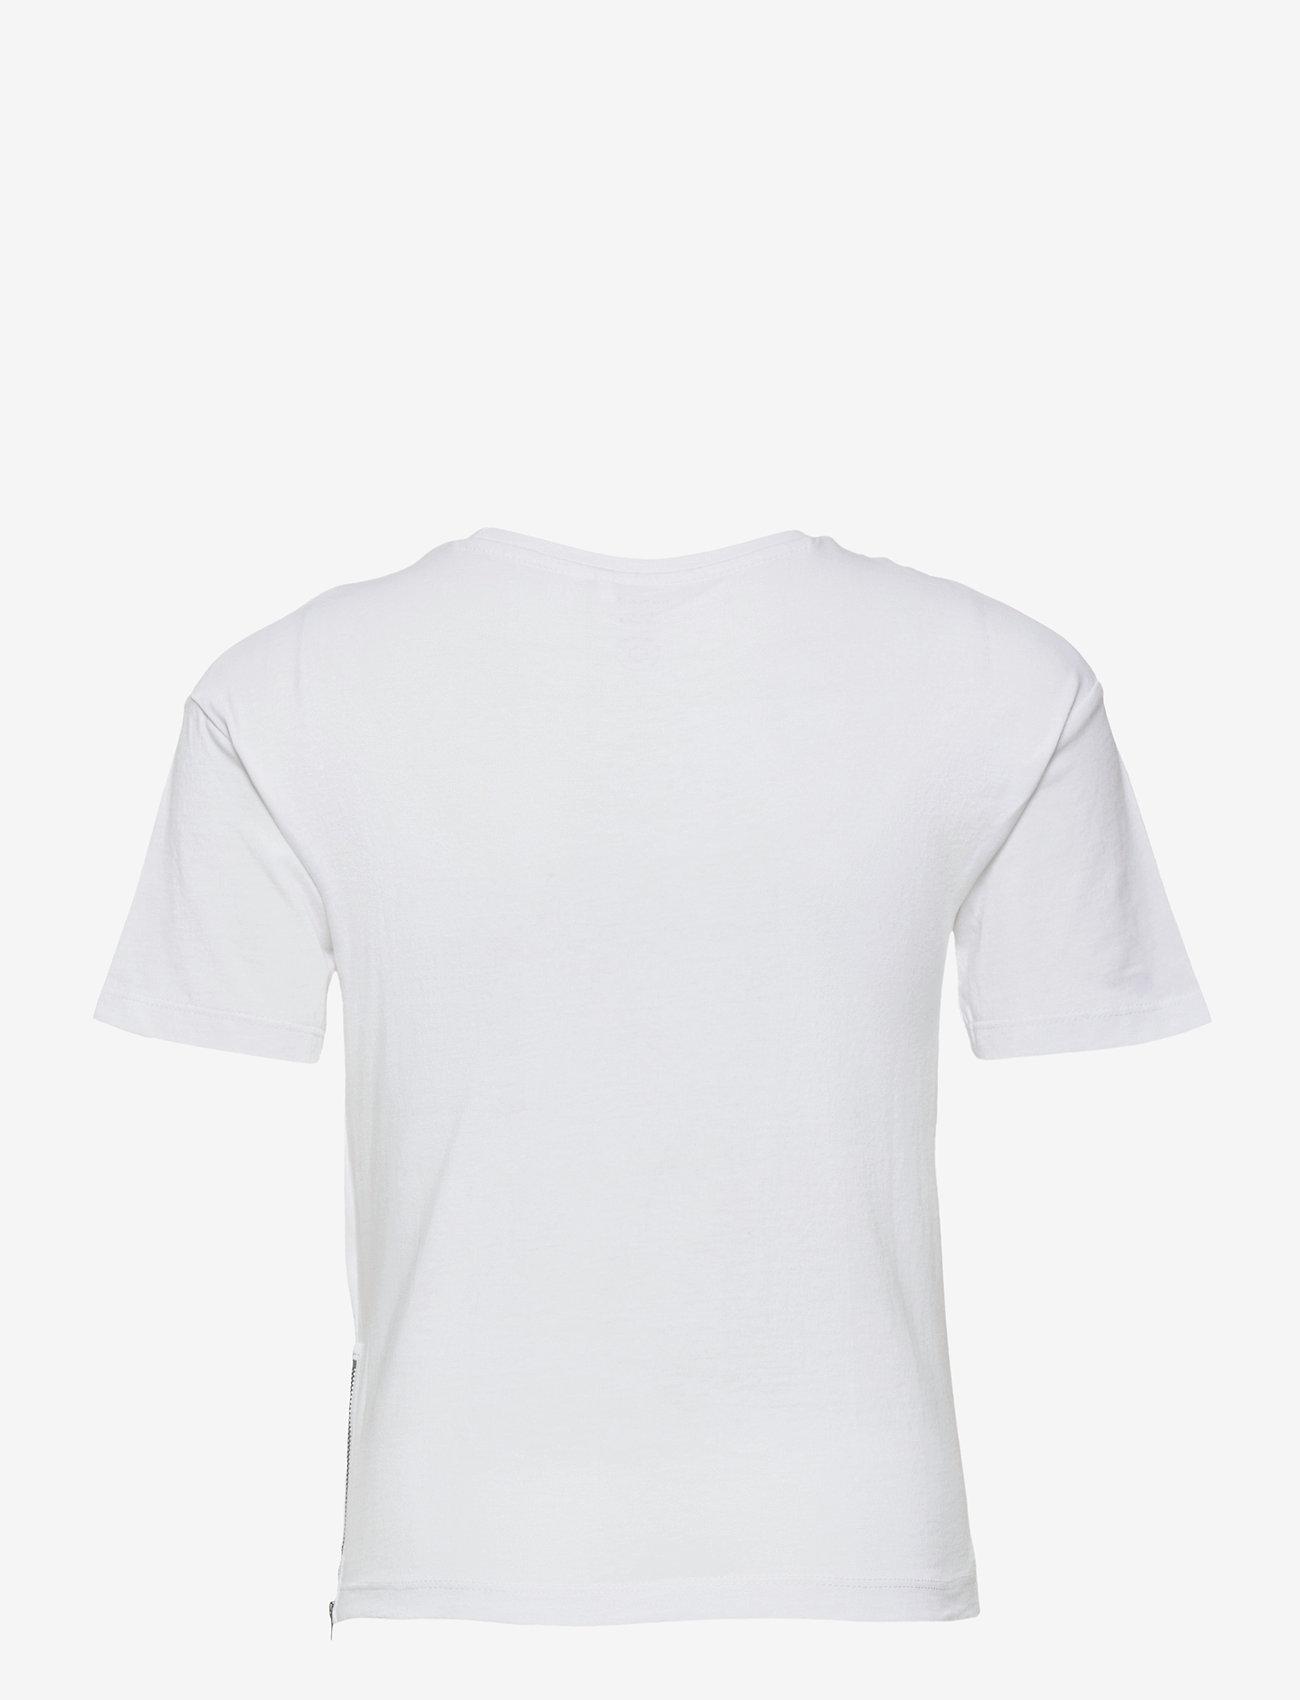 name it - NKMBALDERVI SS TOP - t-shirts - bright white - 1